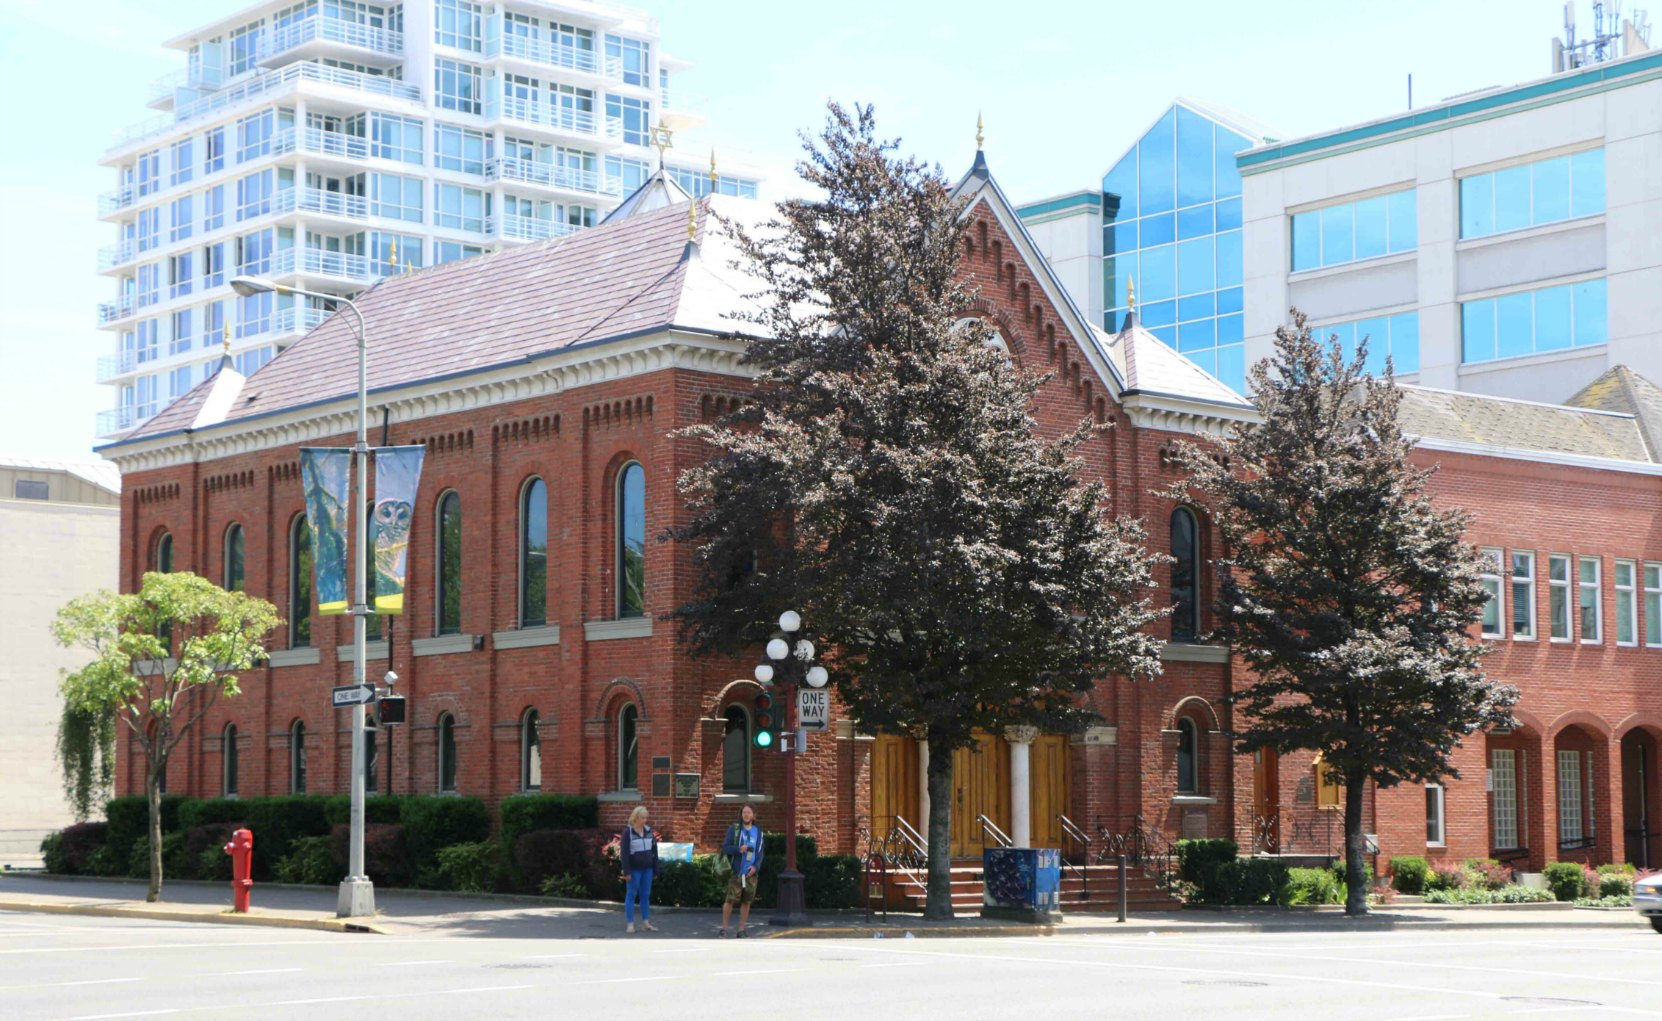 Congregation Emanu-El Synagogue, 1461 Blanshard Street, Victoria, B.C.